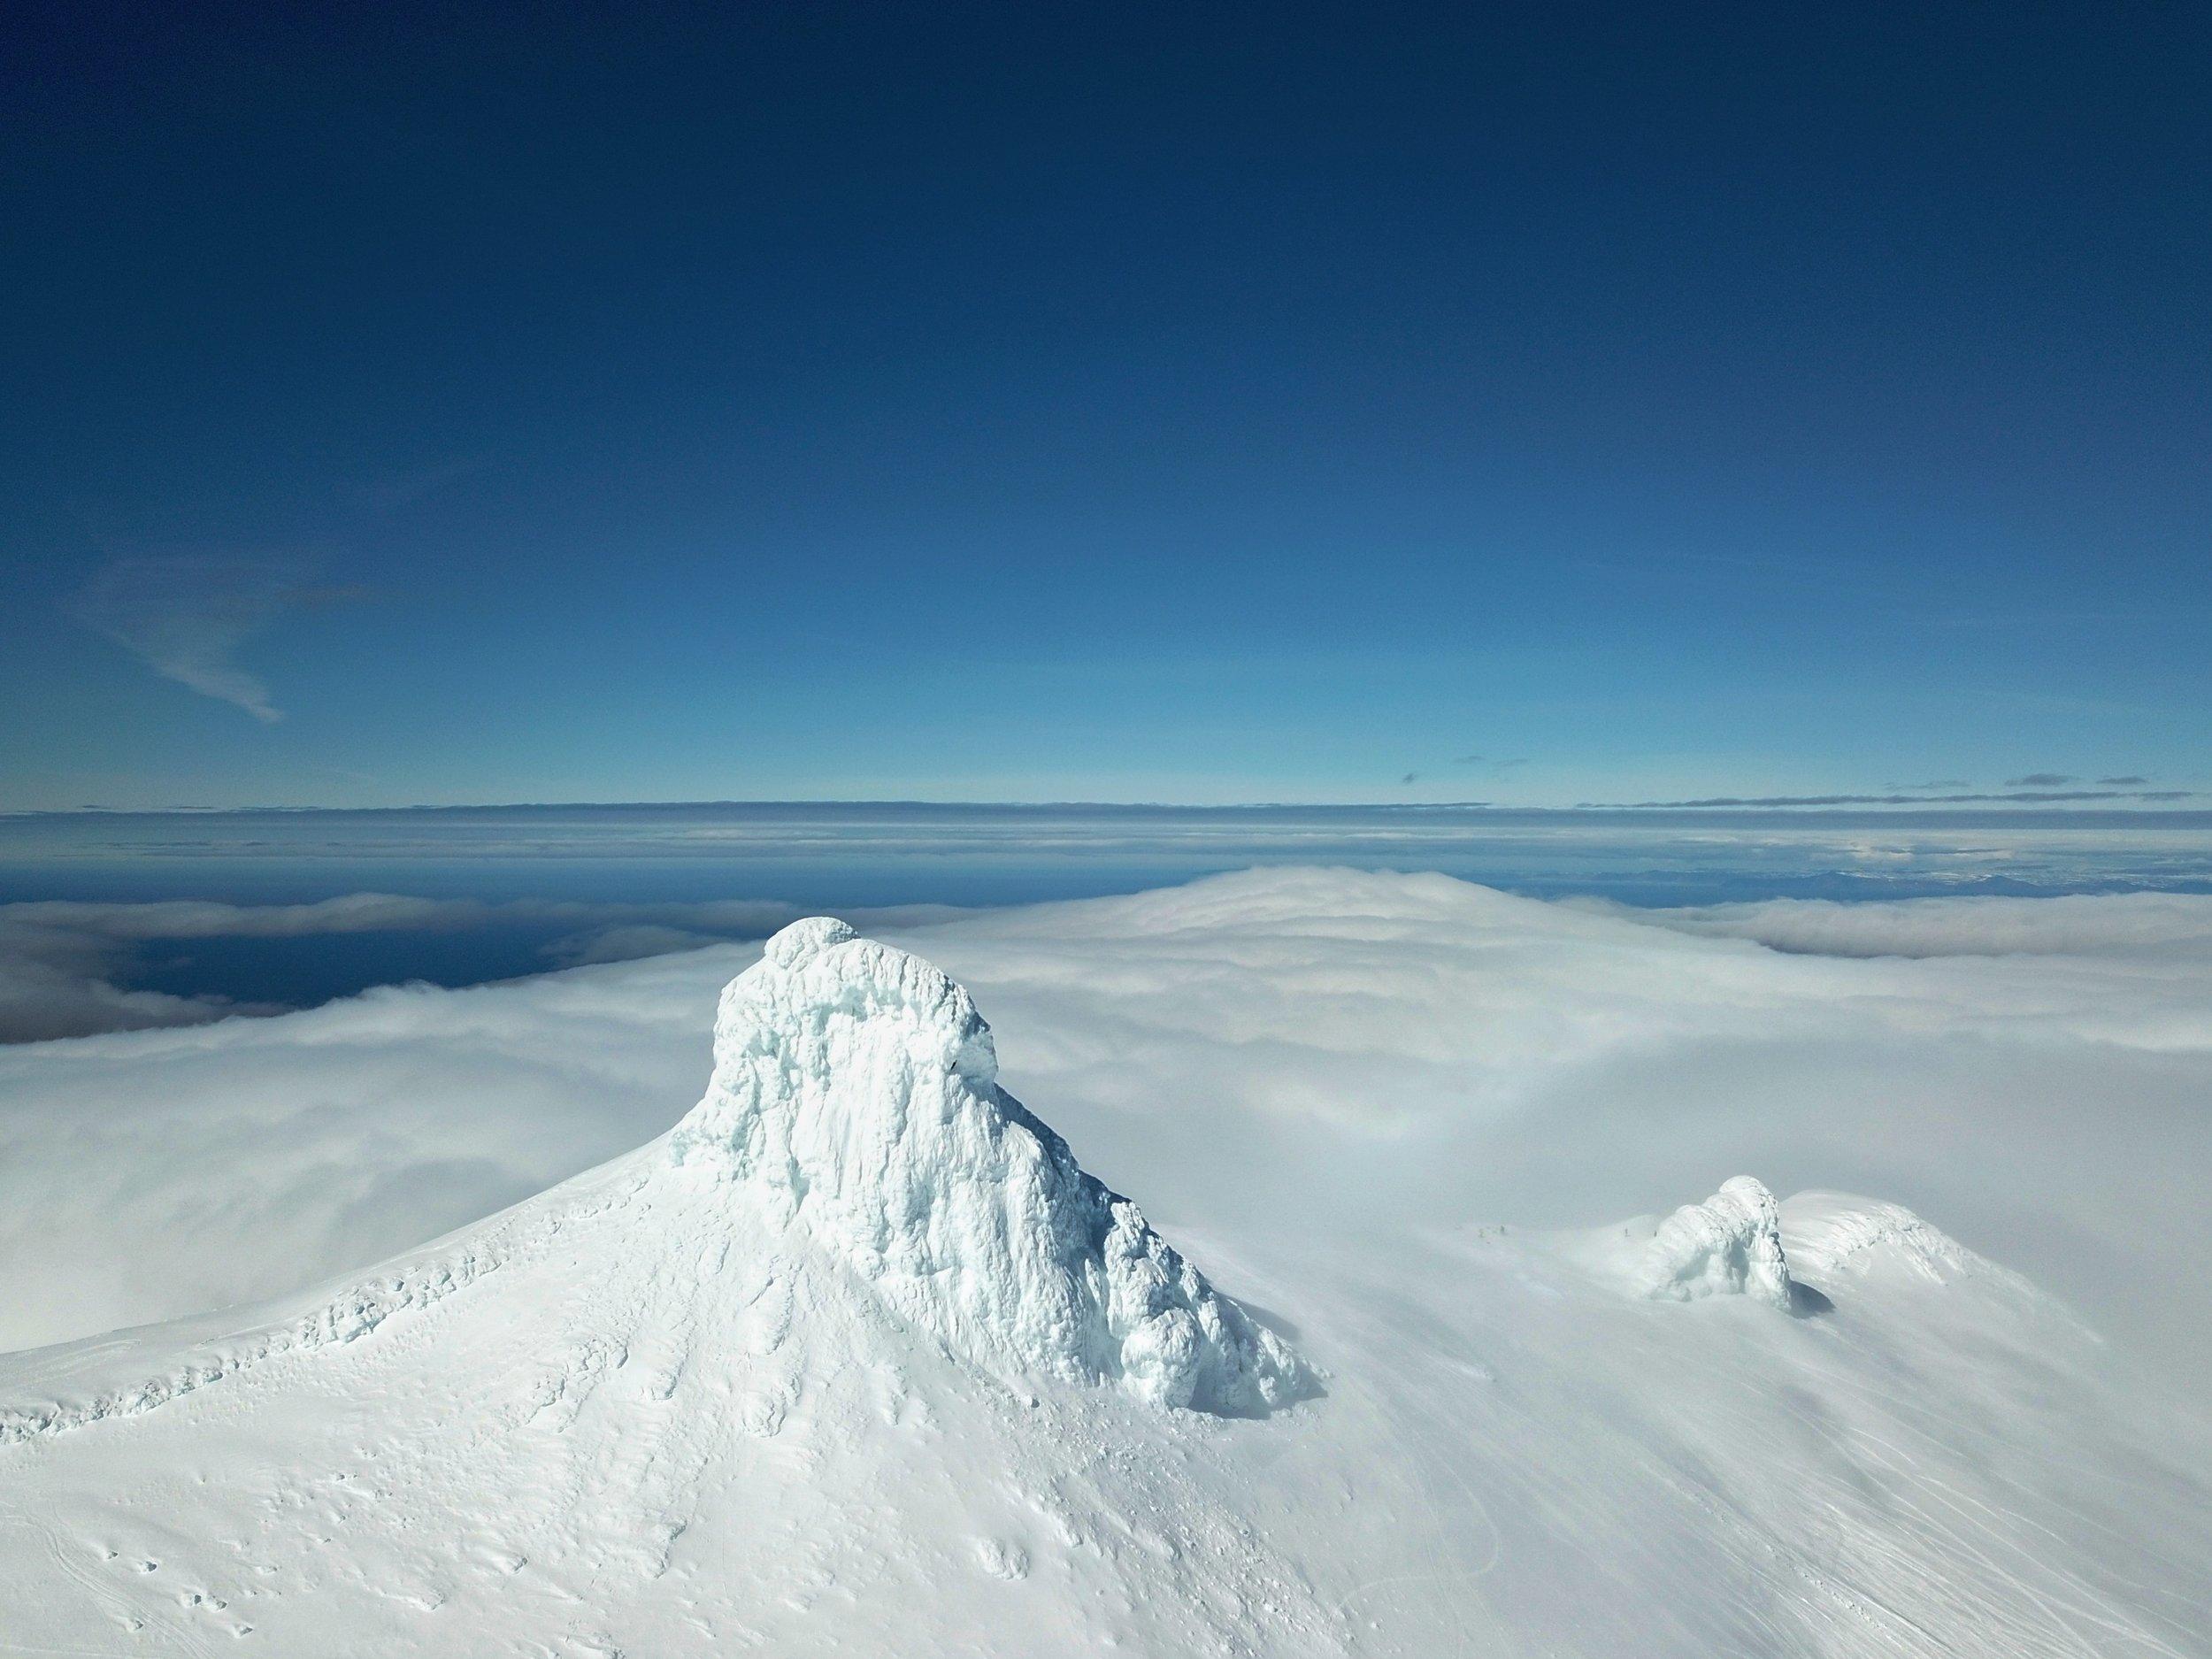 Snæfellsjökull Glacier summit by air